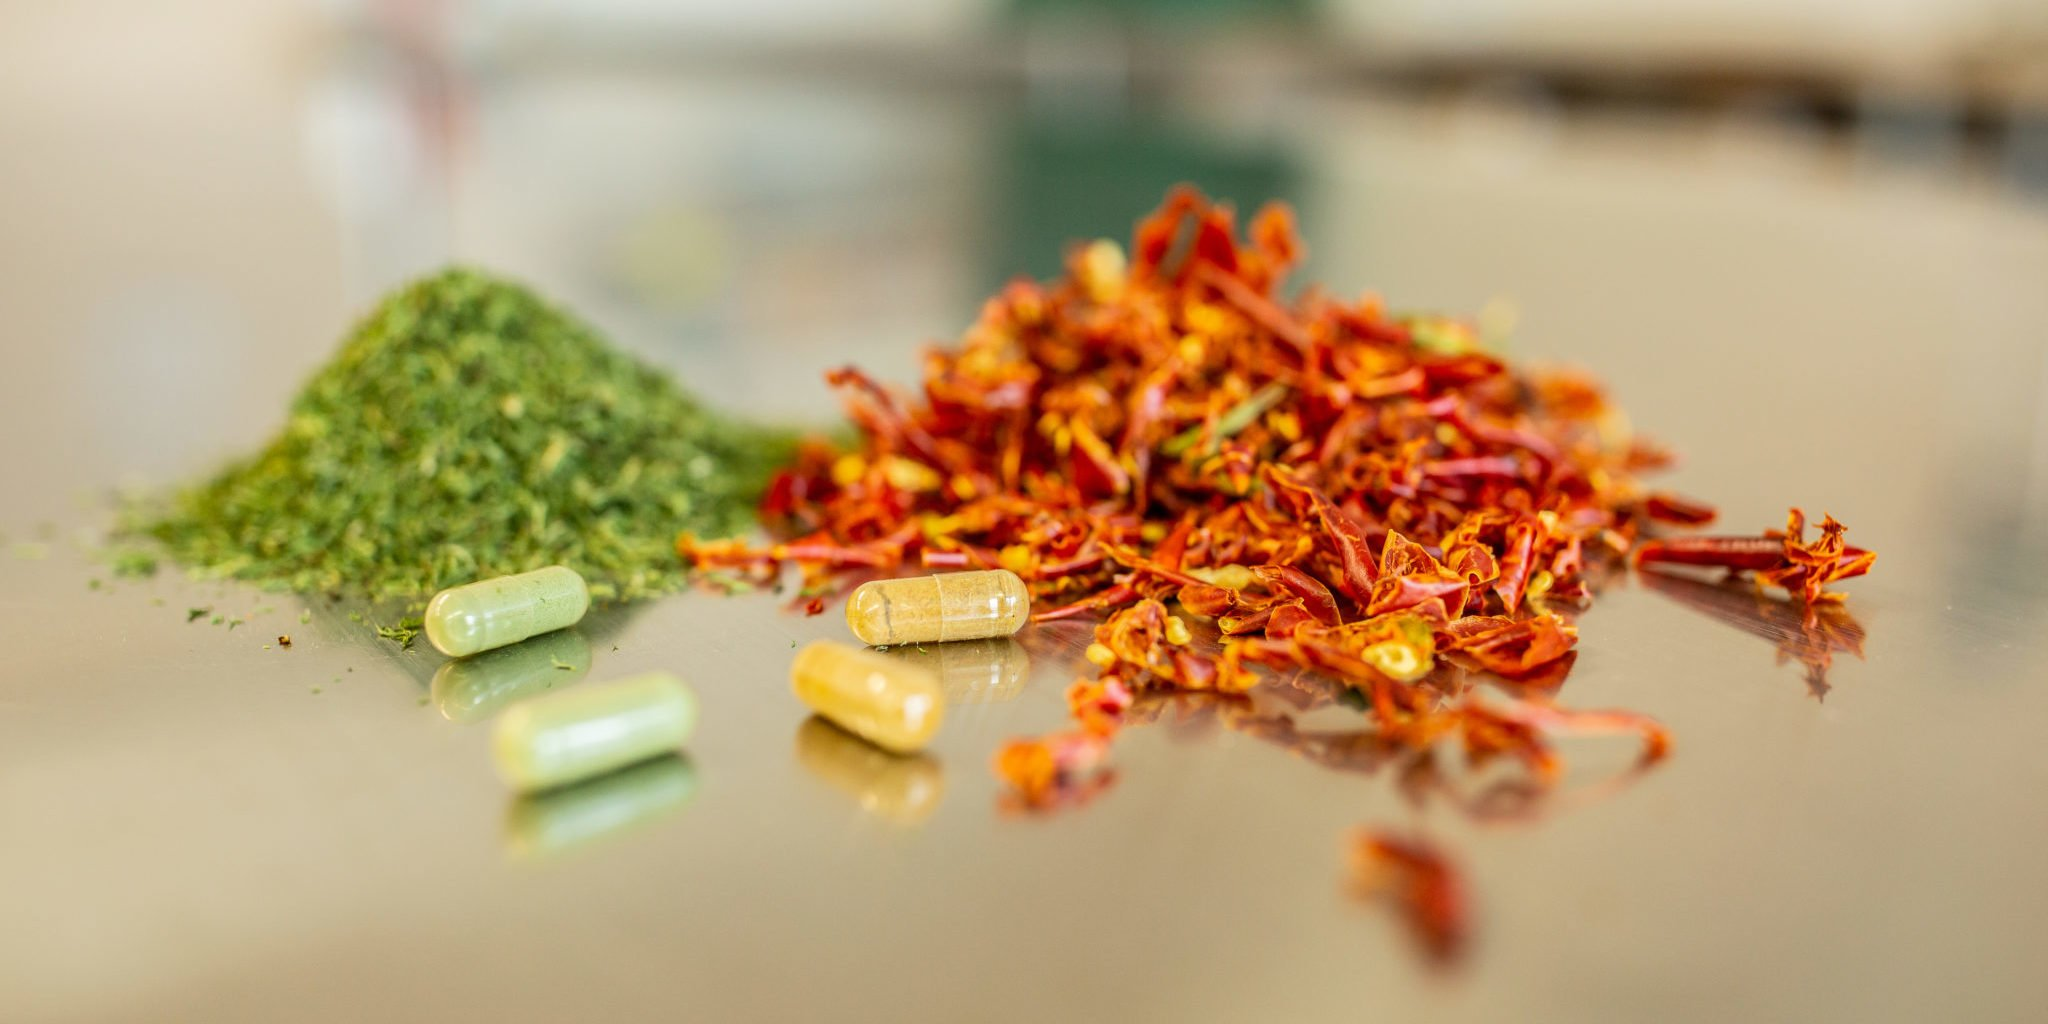 Herkunft rohstoffe moringa schweiz